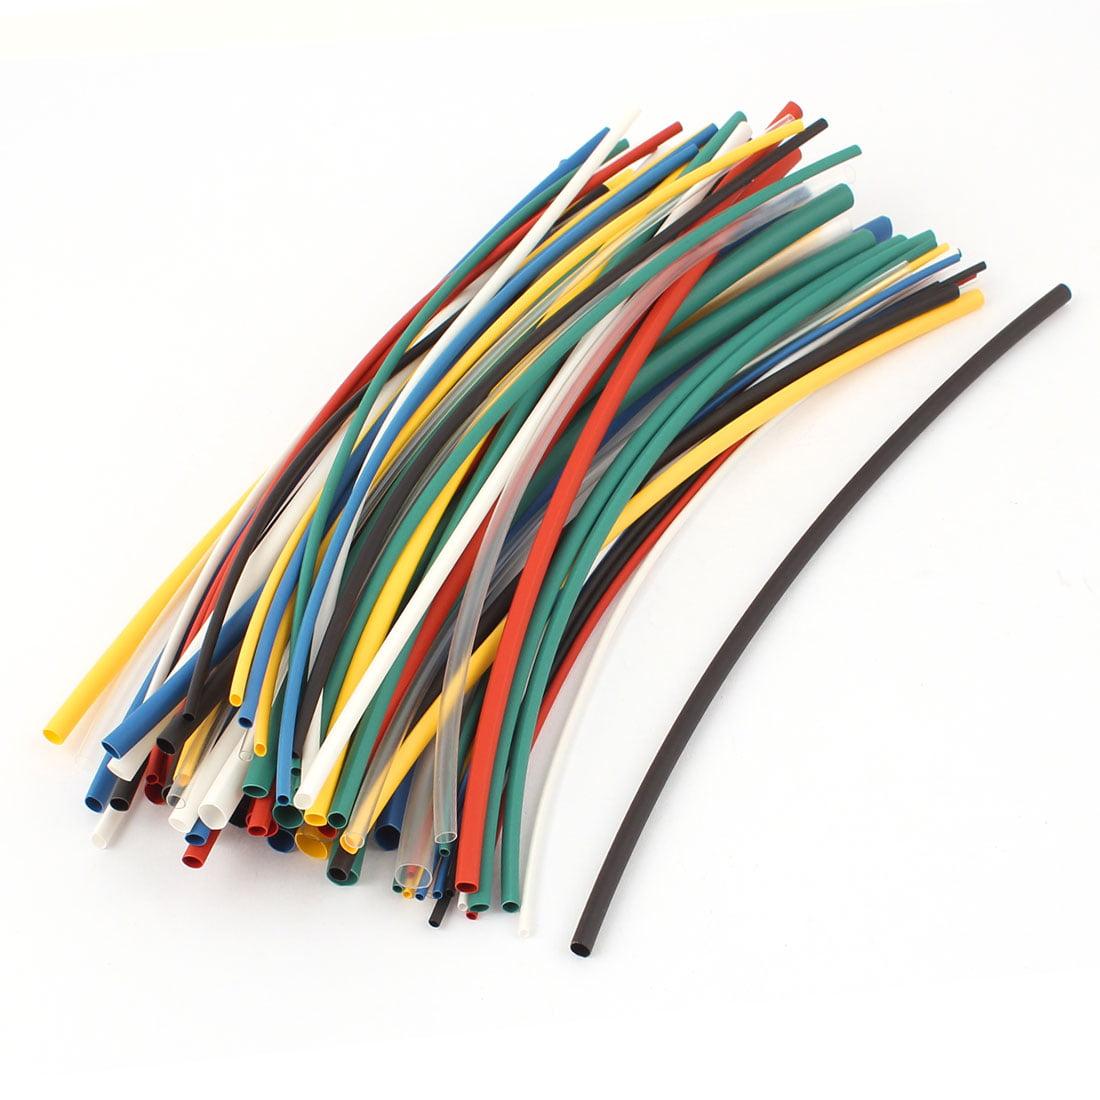 70Pcs 2:1 Heat Shrink Tube Wire Wrap Assortment Tubing Sleeve 5 Sizes Kit